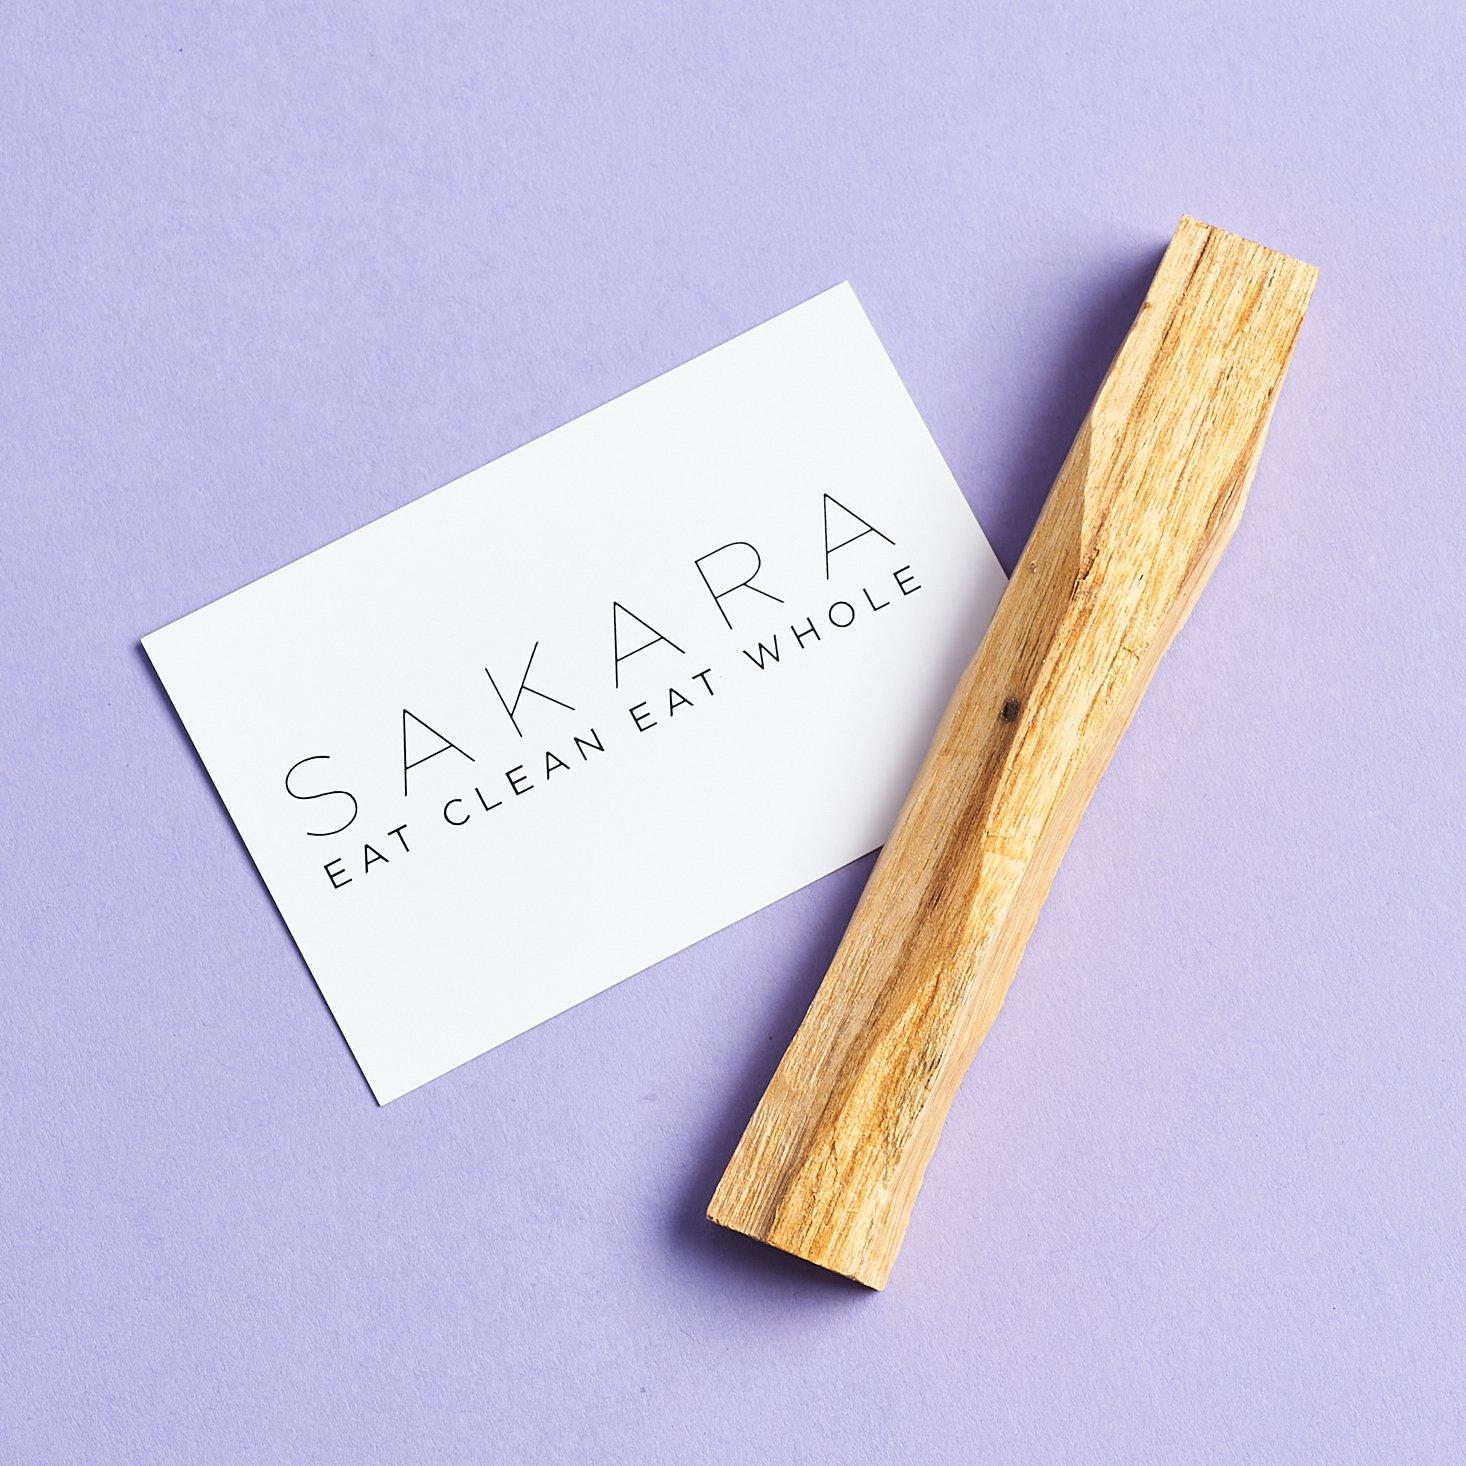 Palo Santo from Sakara Life